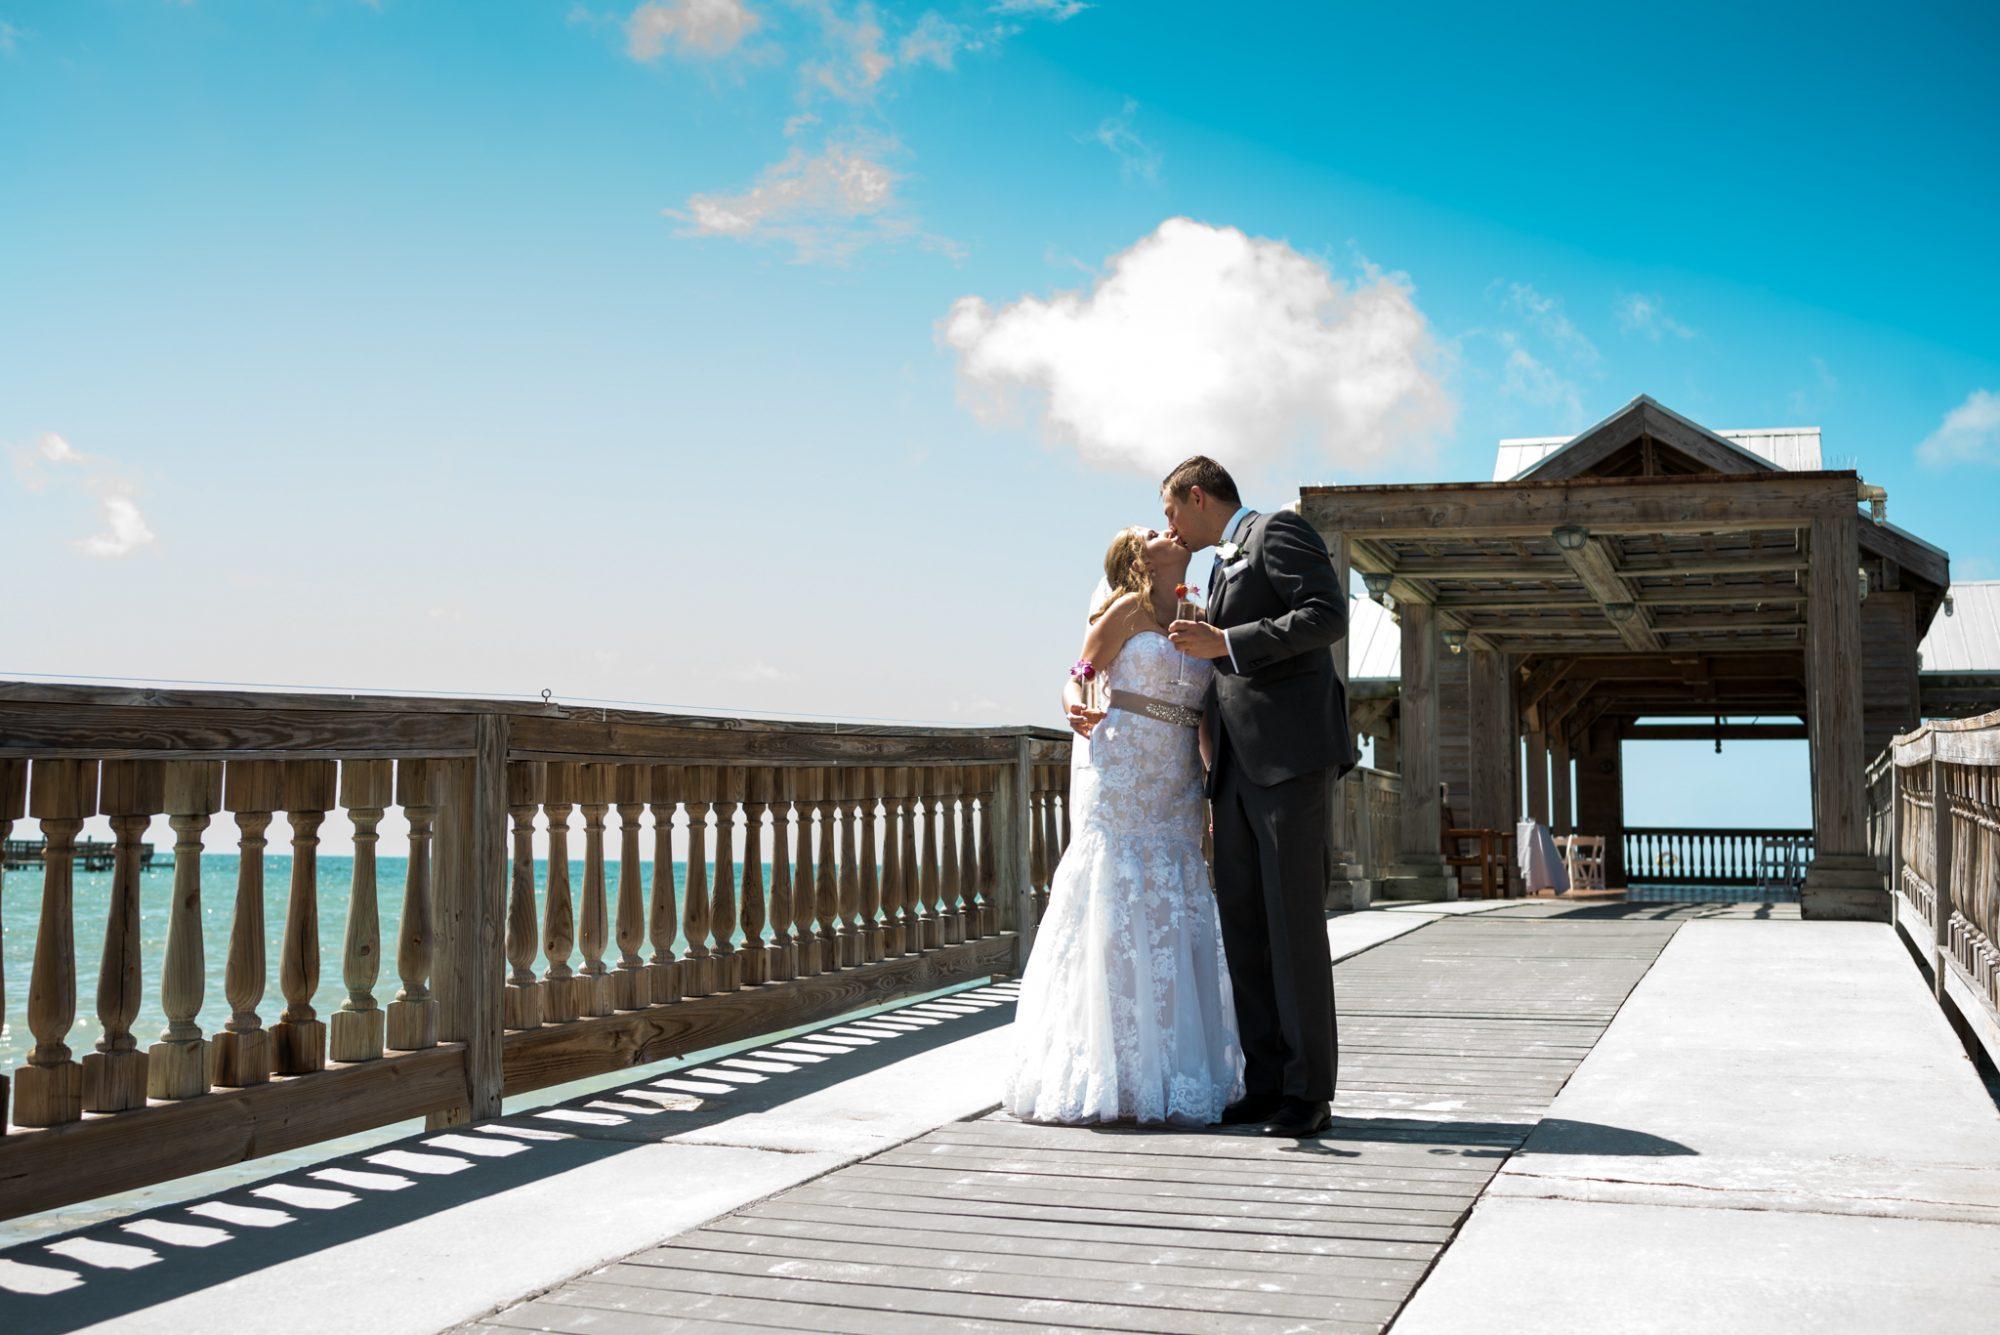 Stacey Jason Key West Wedding Photographer Reach Resort 24 - Stacy & Jason - Key West Wedding Photographer - Reach Resort